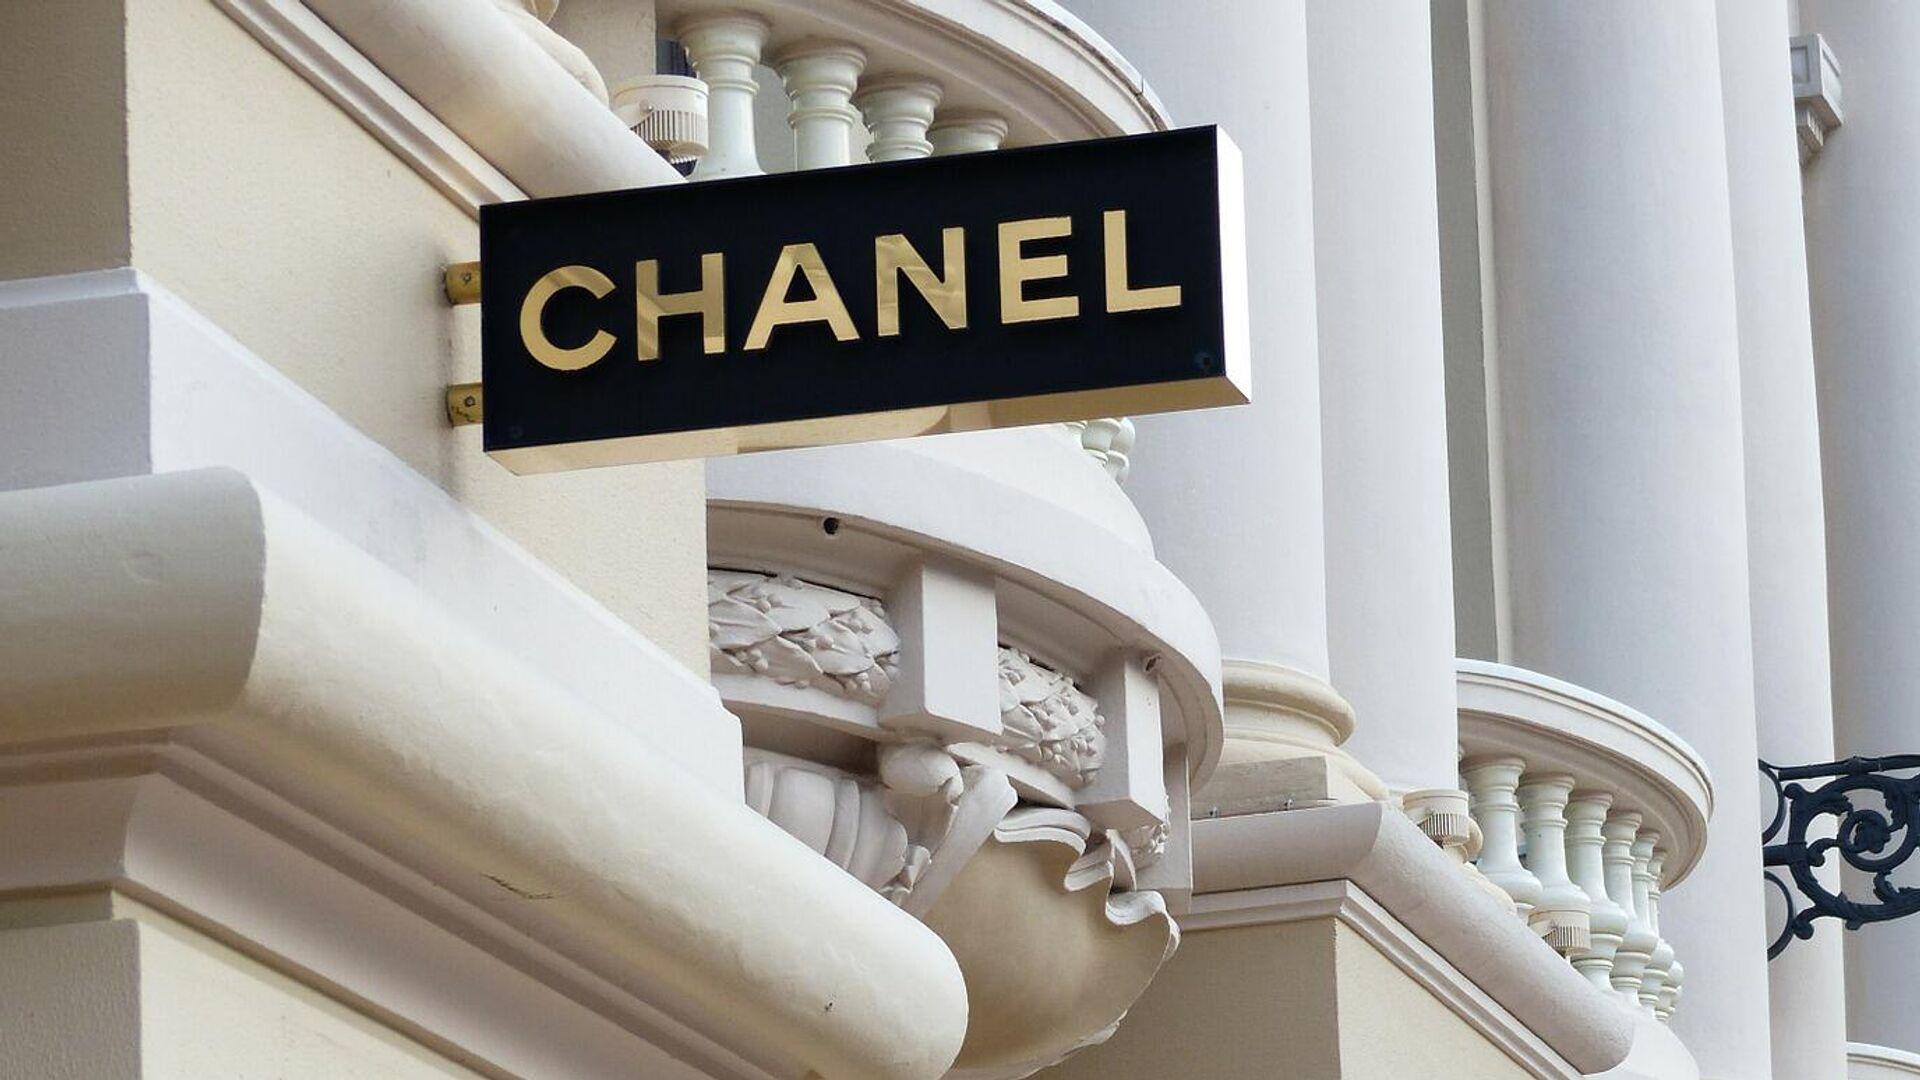 Una tienda de la marca francesa Chanel - Sputnik Mundo, 1920, 11.10.2021